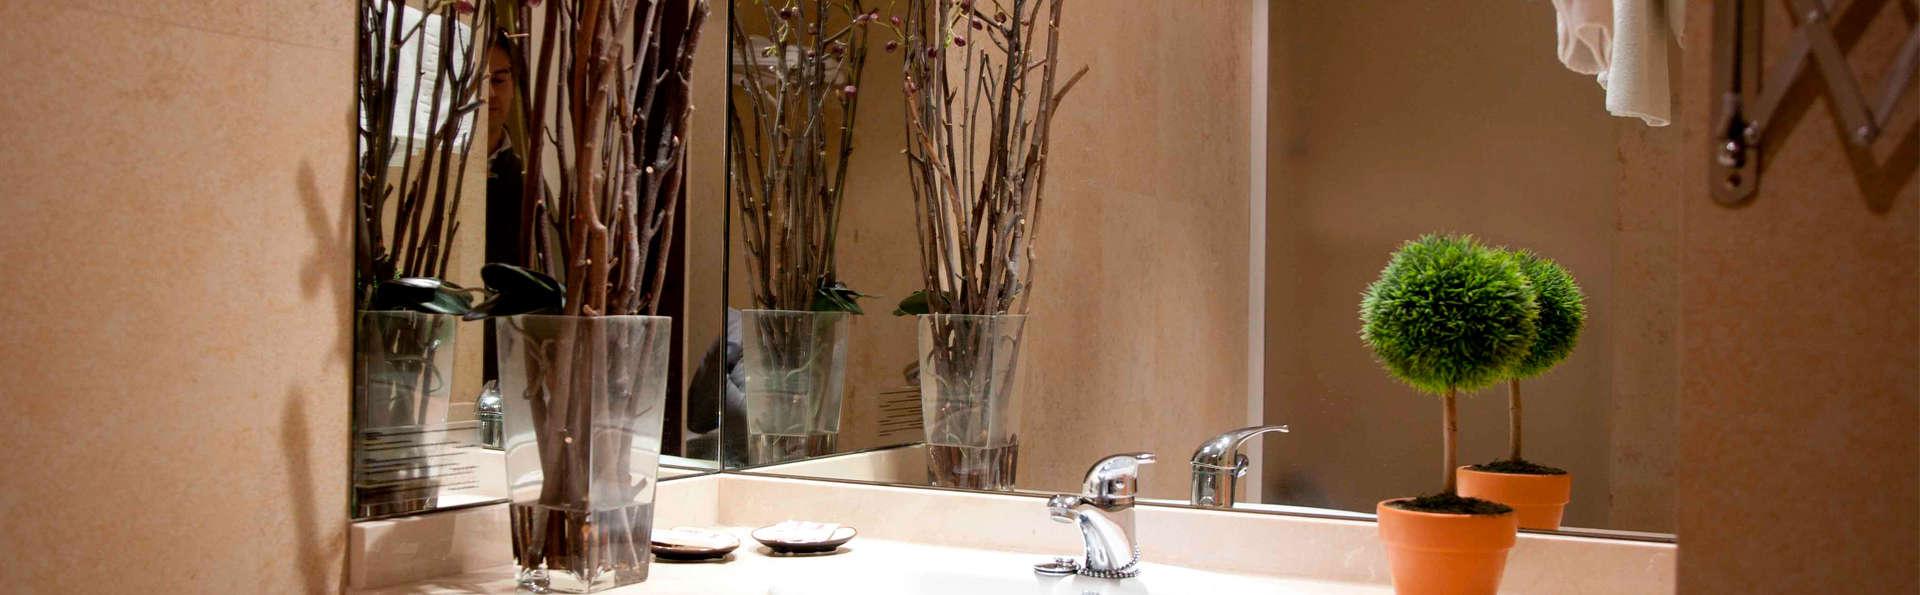 Hotel El Mesón - edit_bathroom.jpg